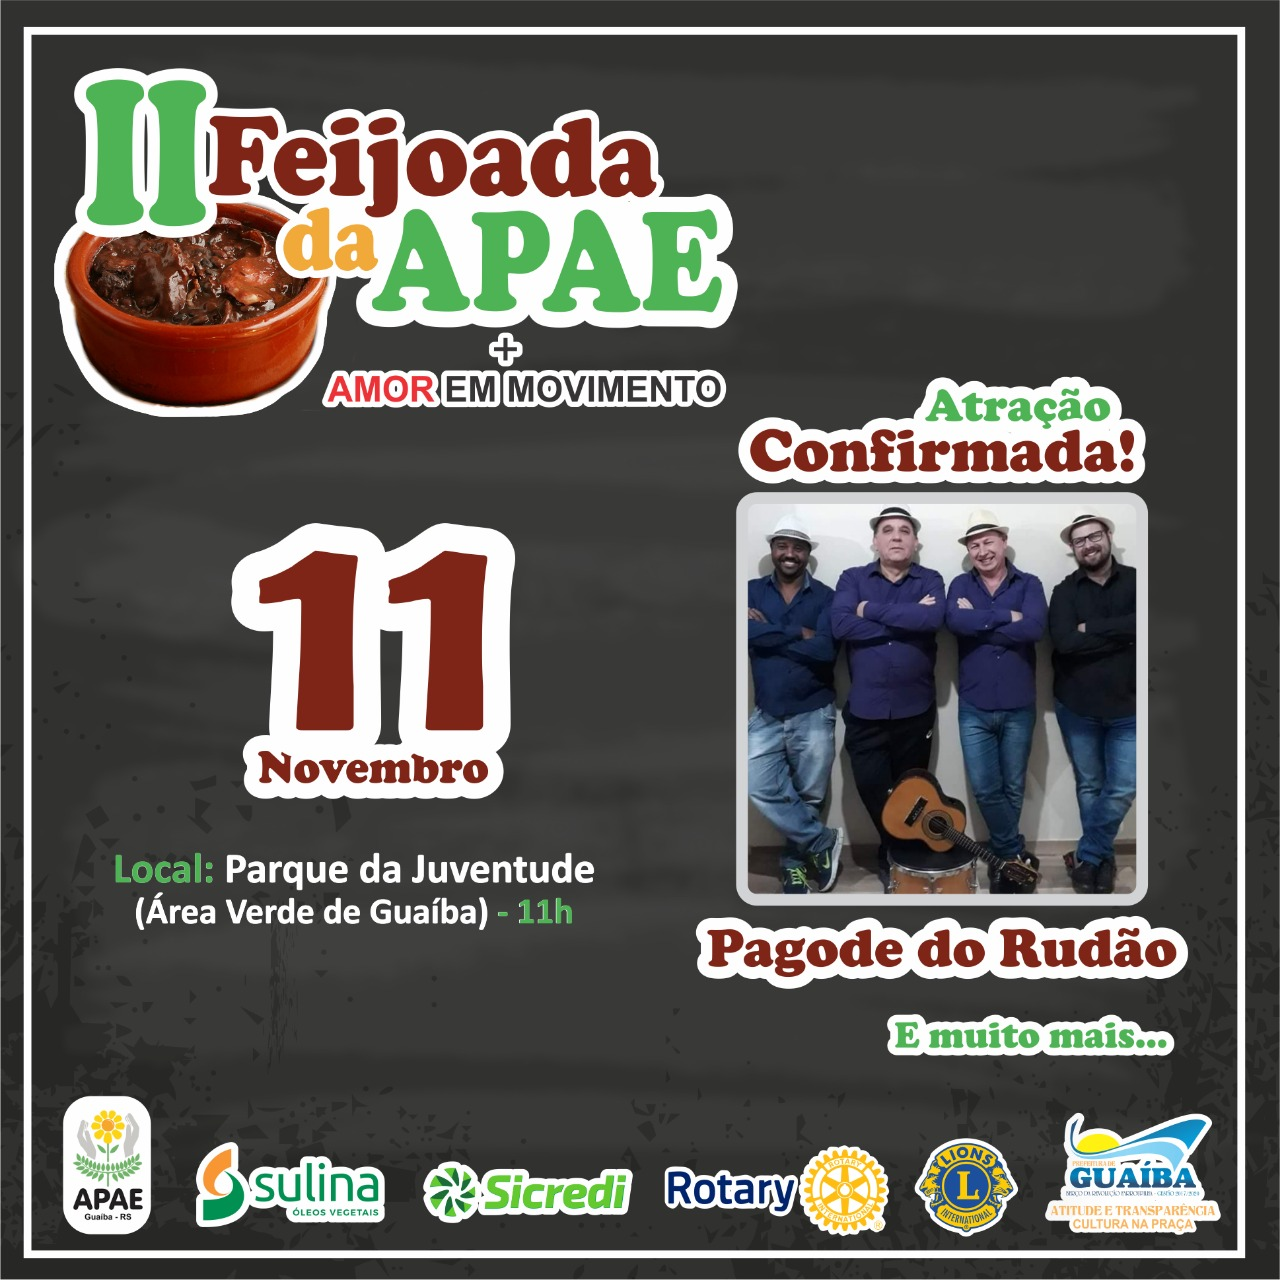 APAE promove II Feijoada + Amor em Movimento